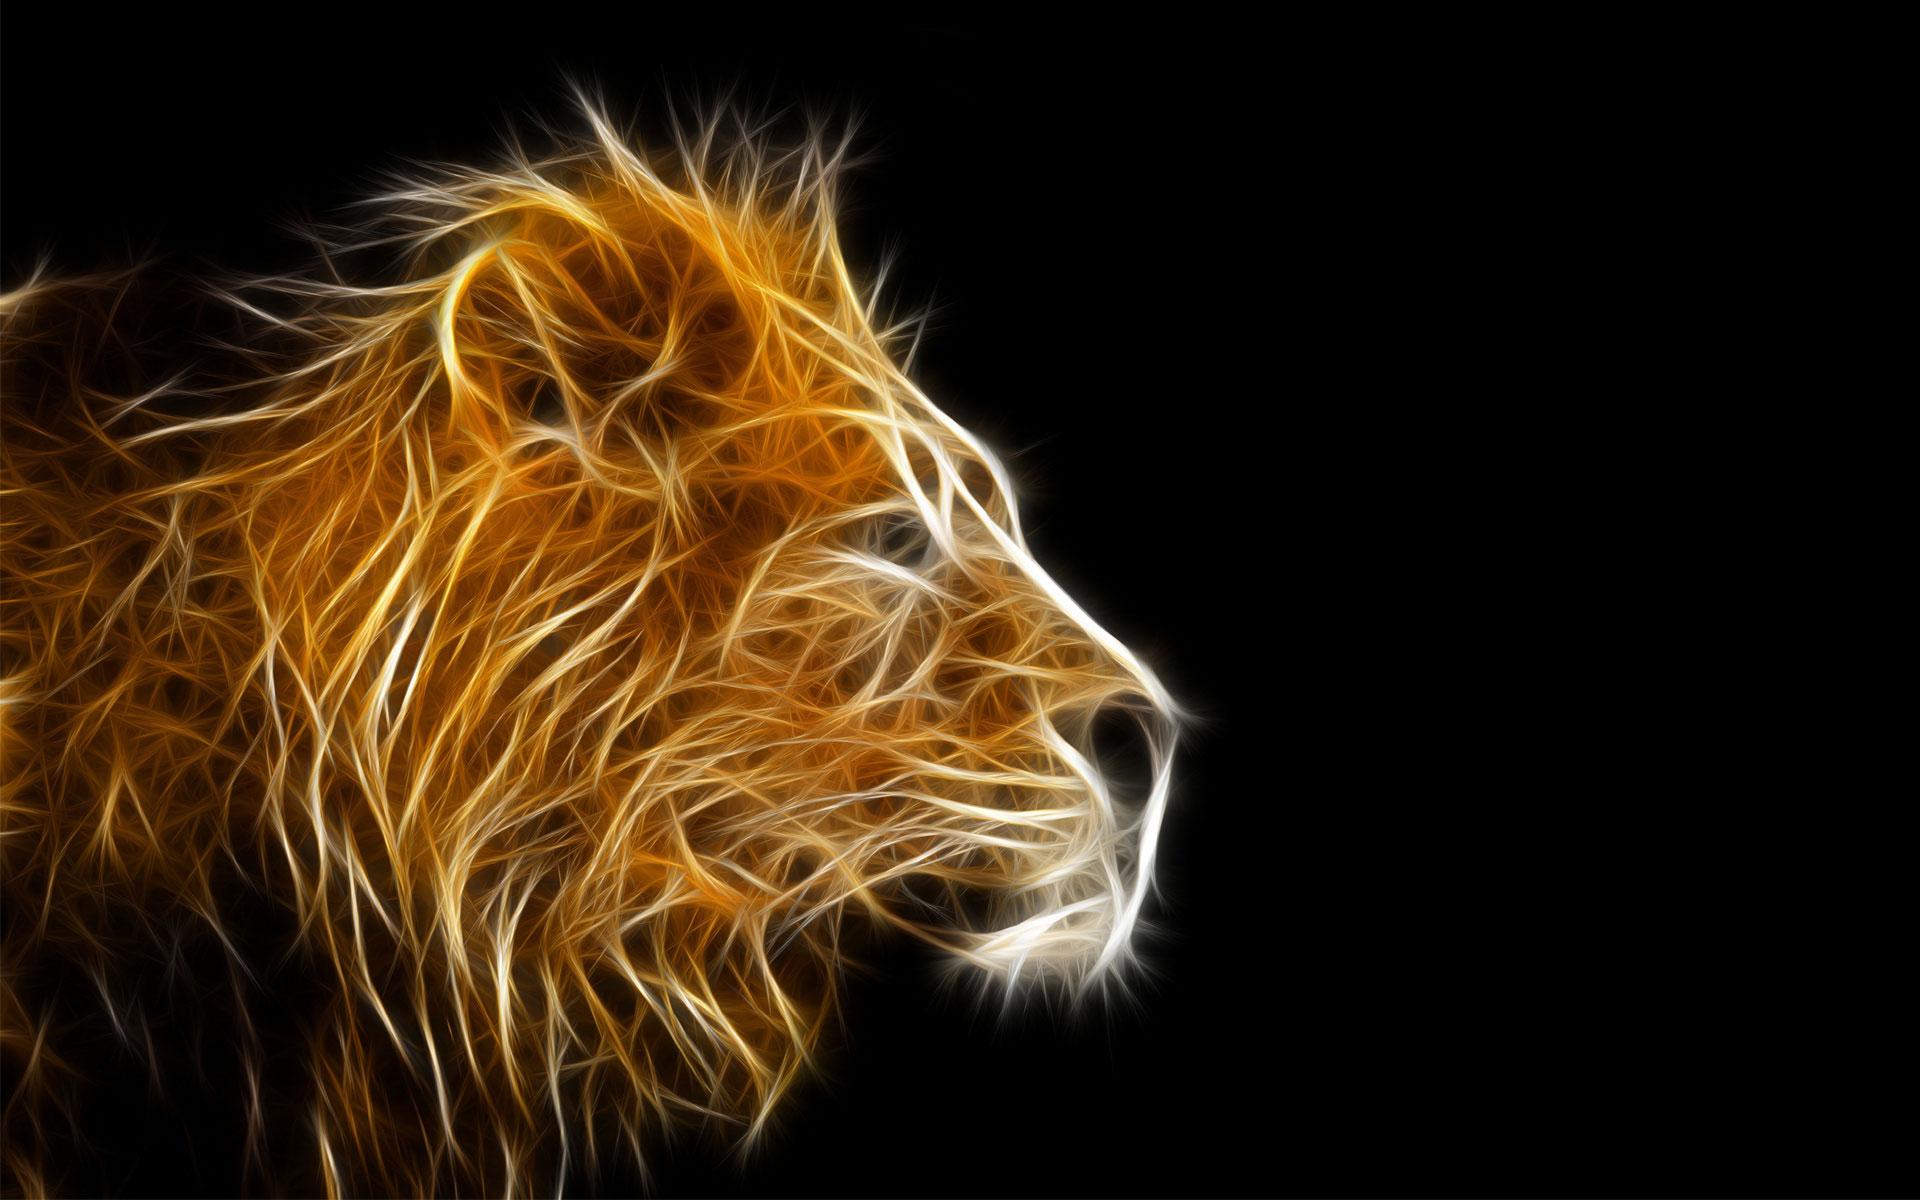 Best 3D Animal Wallpaper HD Animated Animal Wallpaper 1920x1200